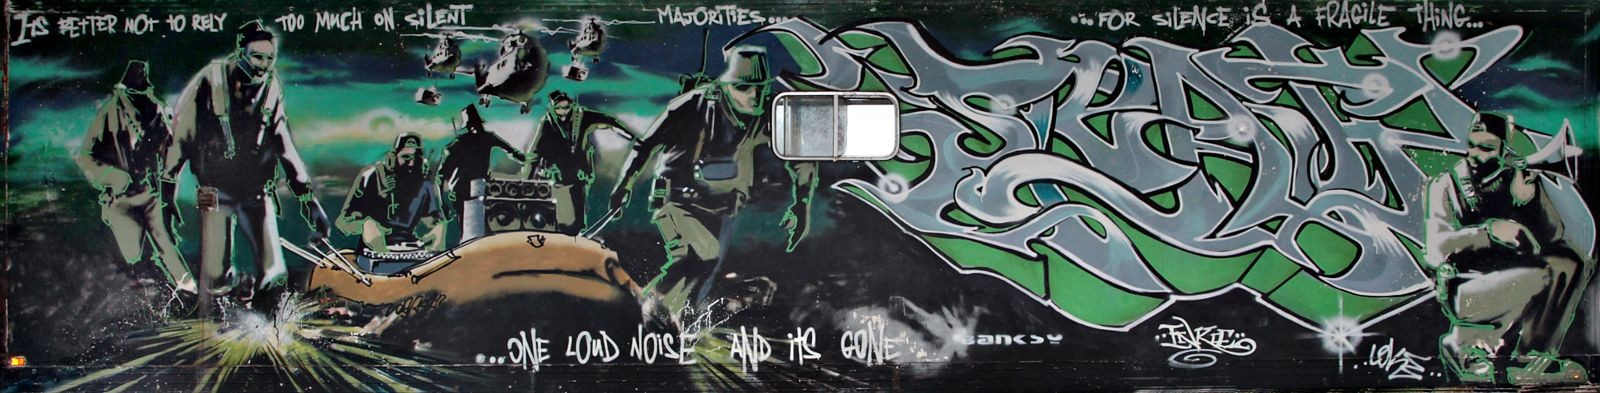 Banksy-Inkie-Banksy & Inkie - Silent Majority-1998